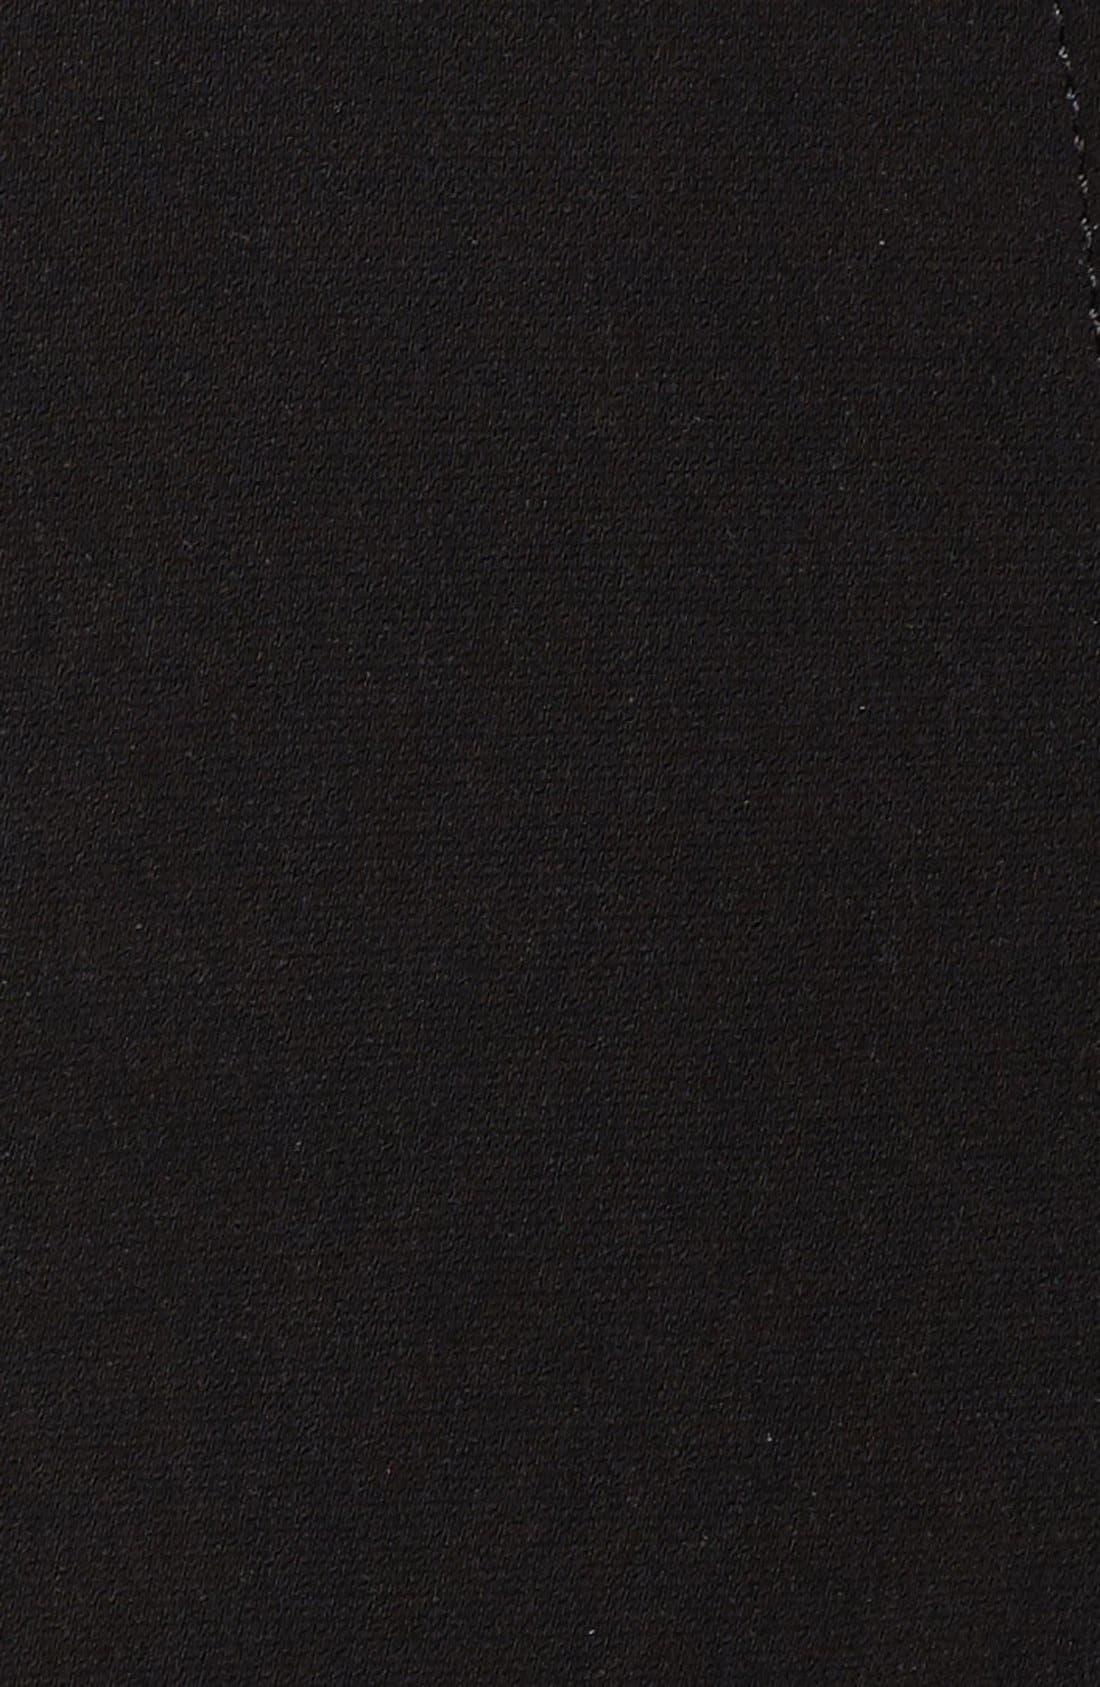 Long Nepage Raincoat with Detachable Hood & Liner,                             Alternate thumbnail 5, color,                             Black